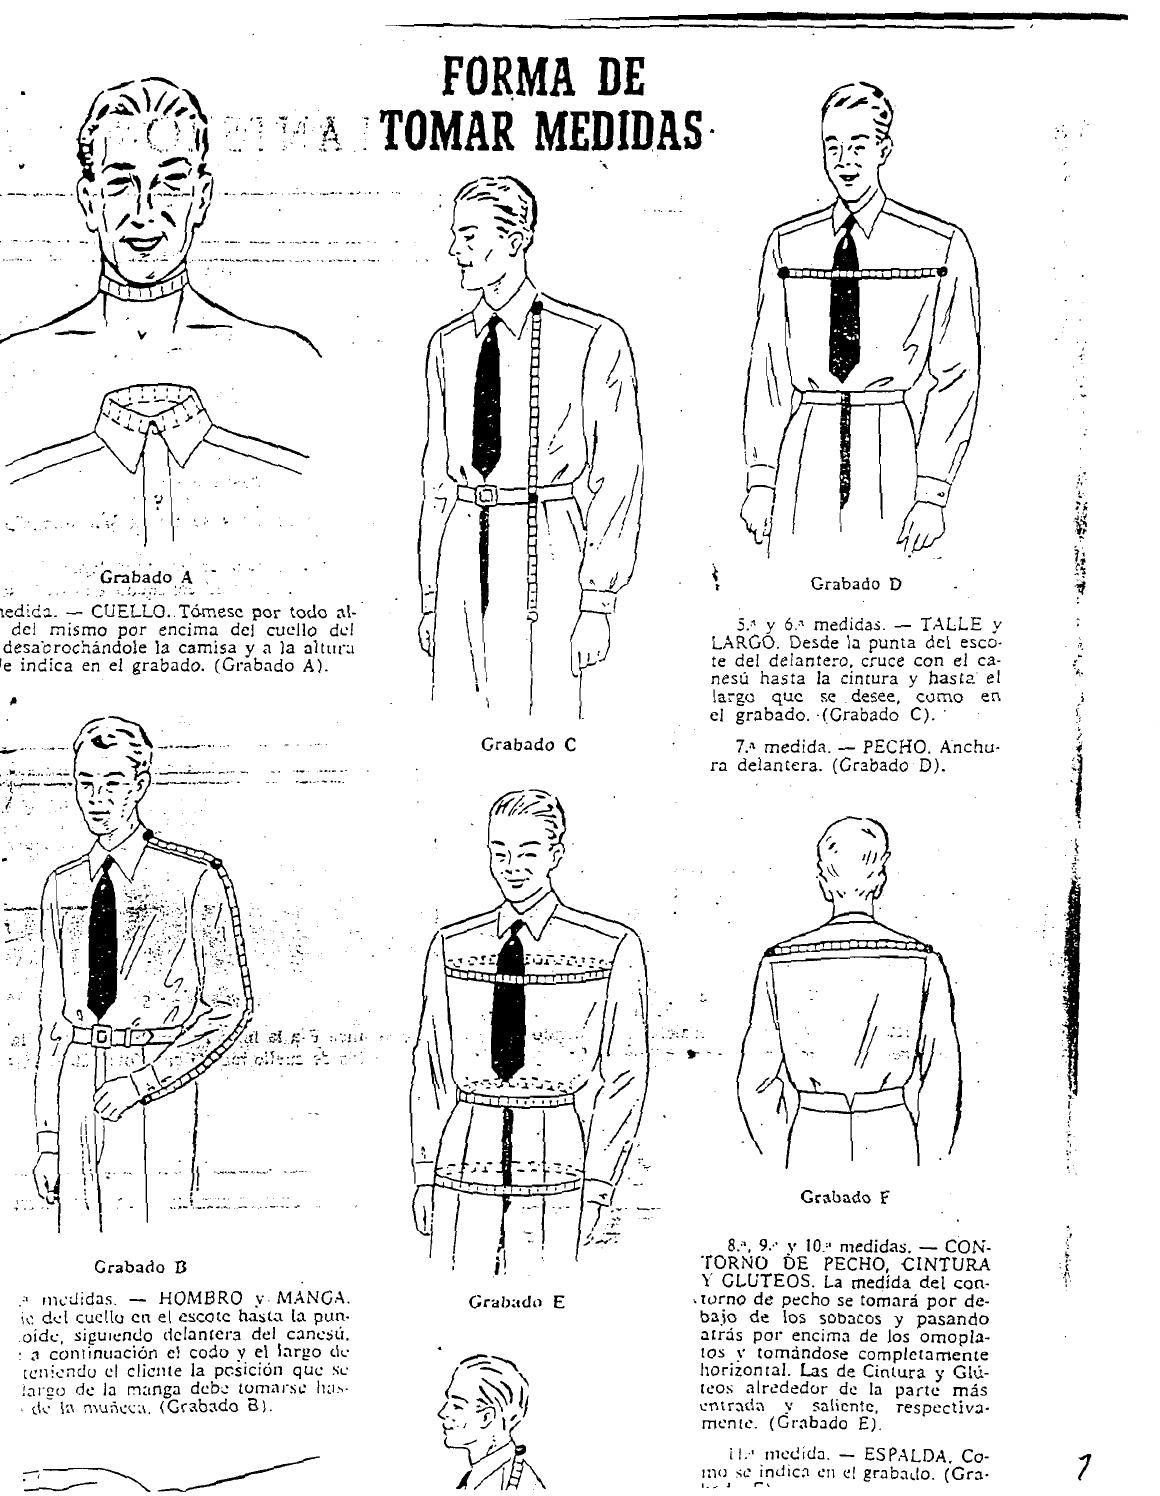 Manual de sastreria masculina forma de tomar medidas(1